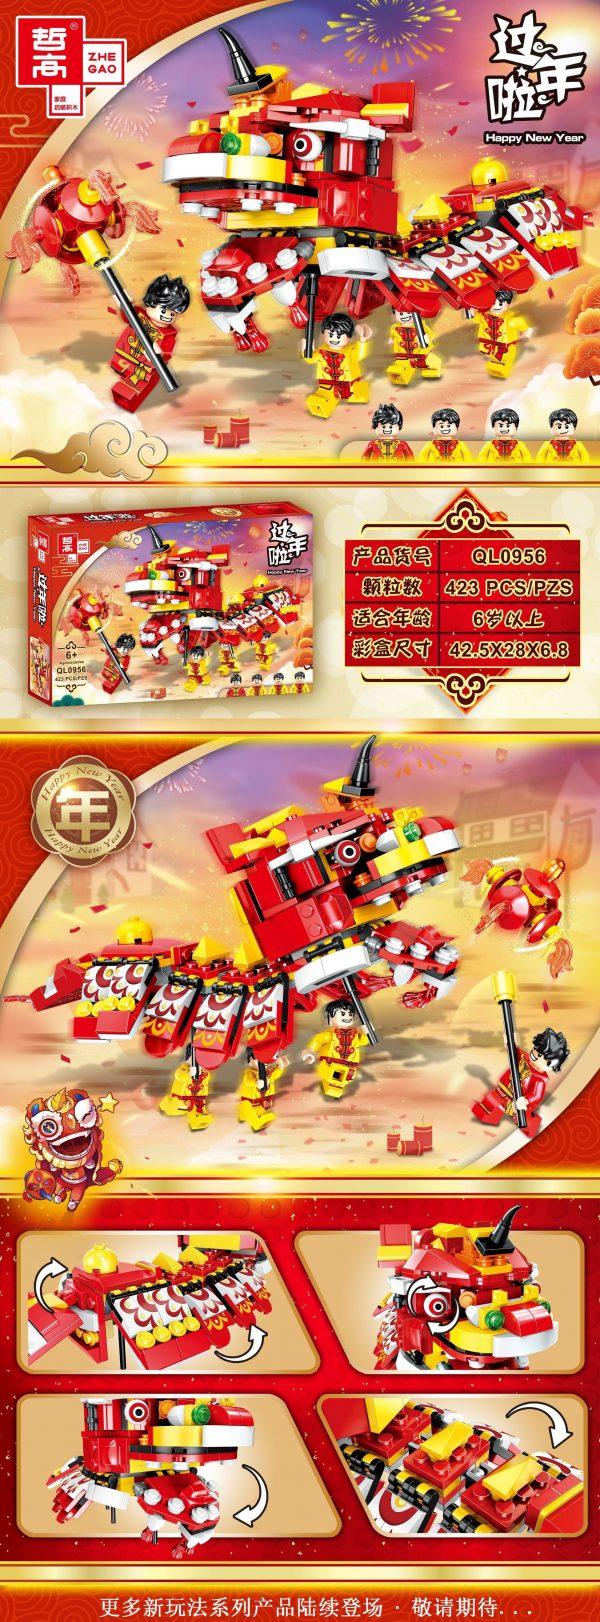 ZHEGAO QL0956 New Year's Day: Lion Dance 12